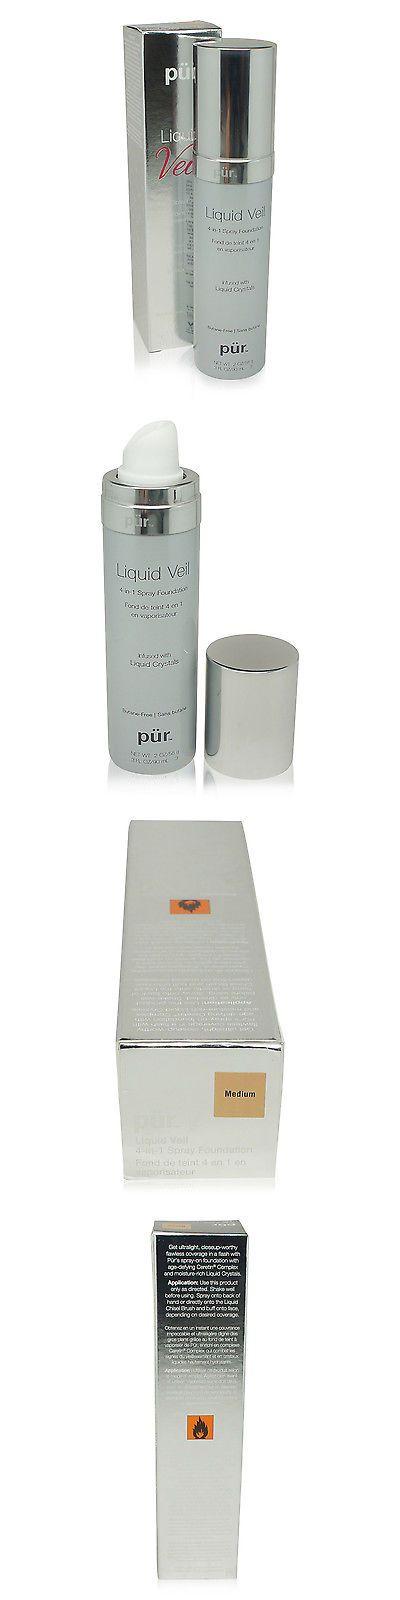 health and beauty: Pür • Liquid Veil 4 In 1 Spray Foundation • Medium • 3Oz • New -> BUY IT NOW ONLY: $31.12 on eBay!